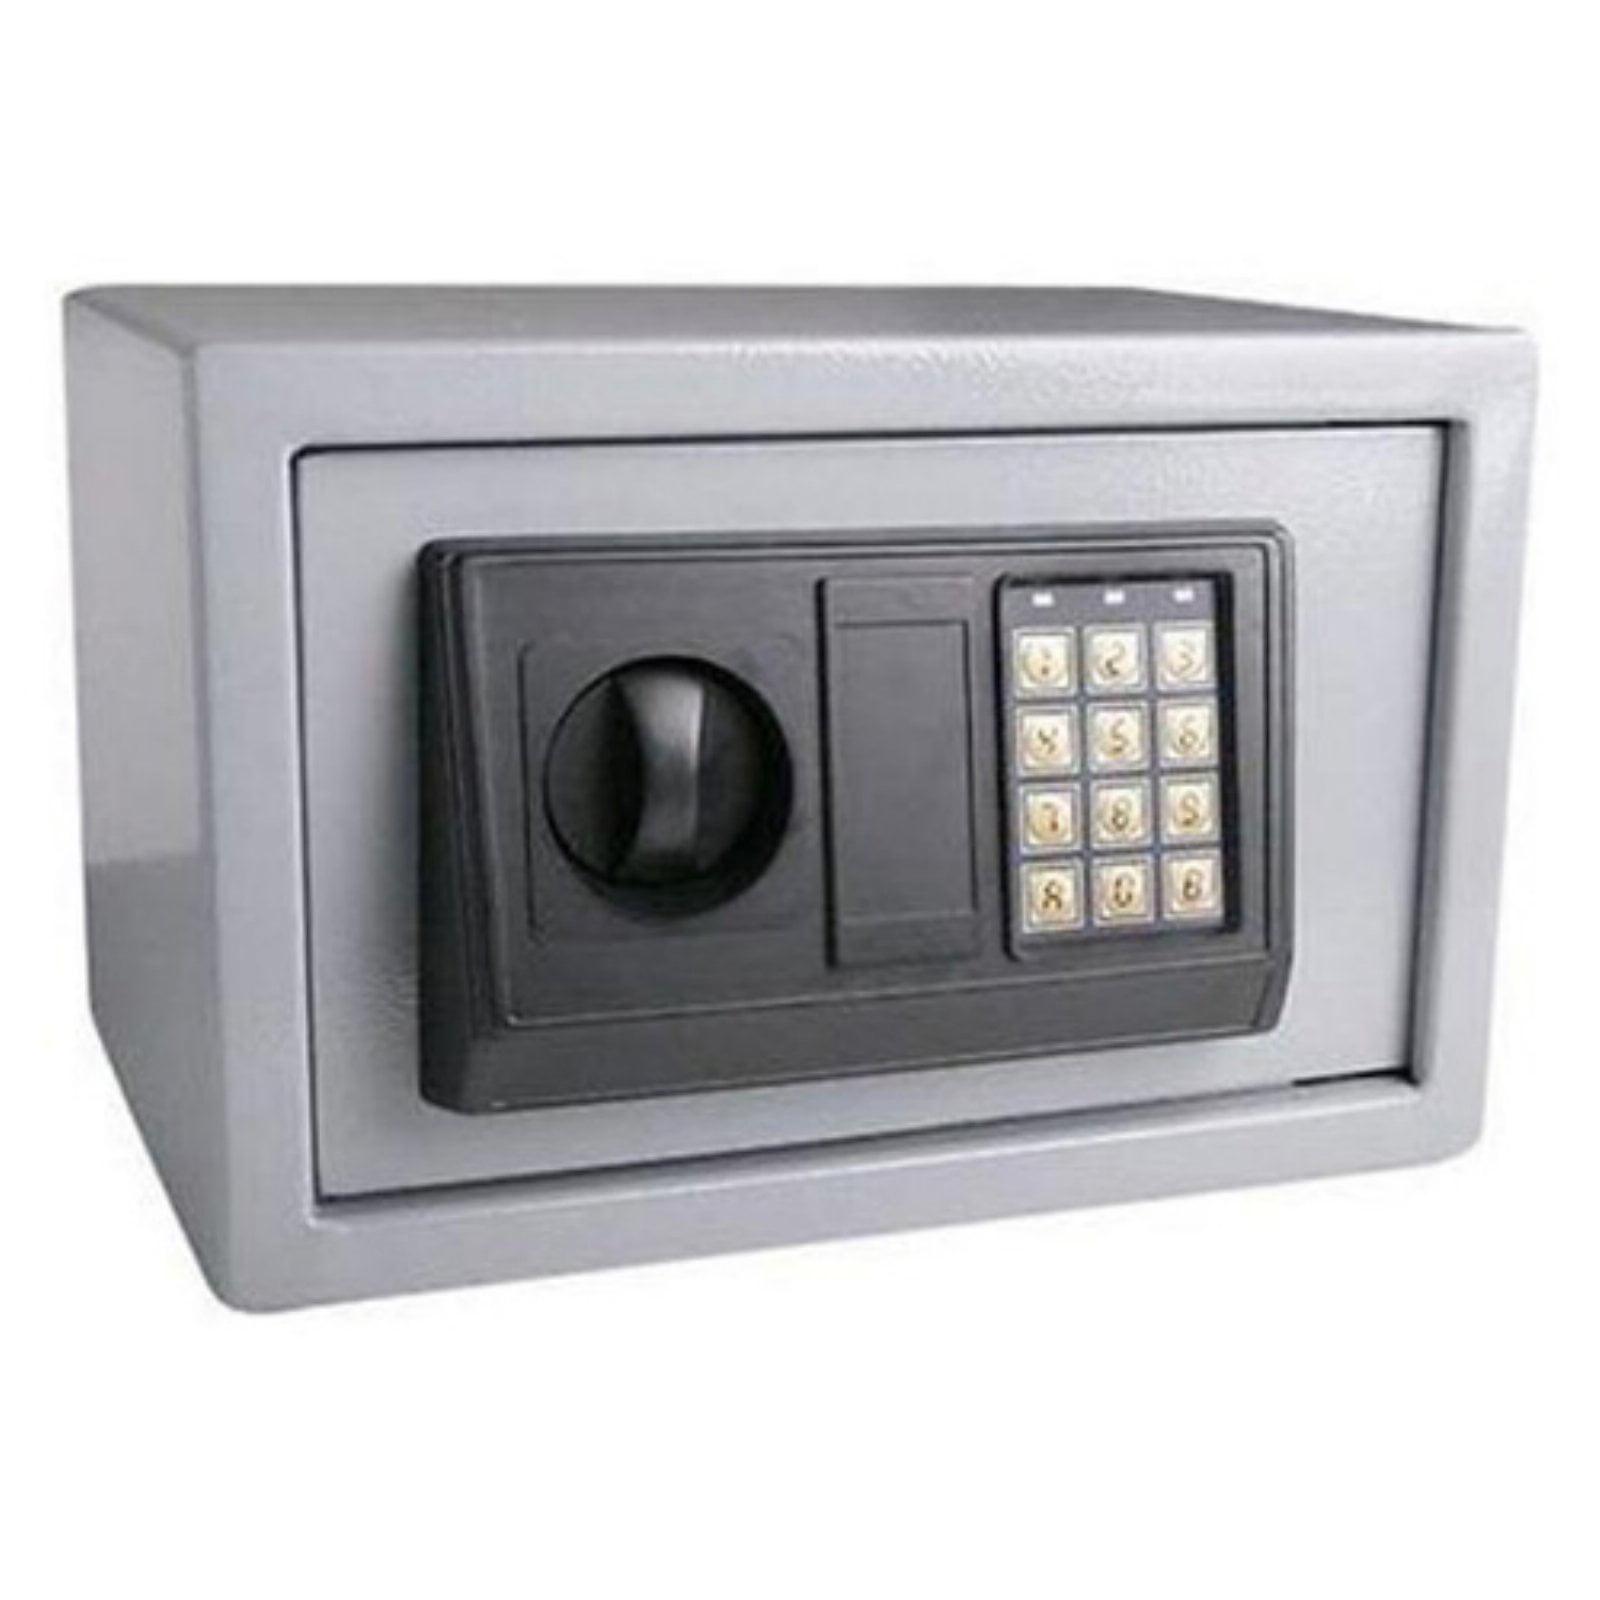 ALEKO Electronic Digital Safe Box for Gun or Jewelry by ALEKO